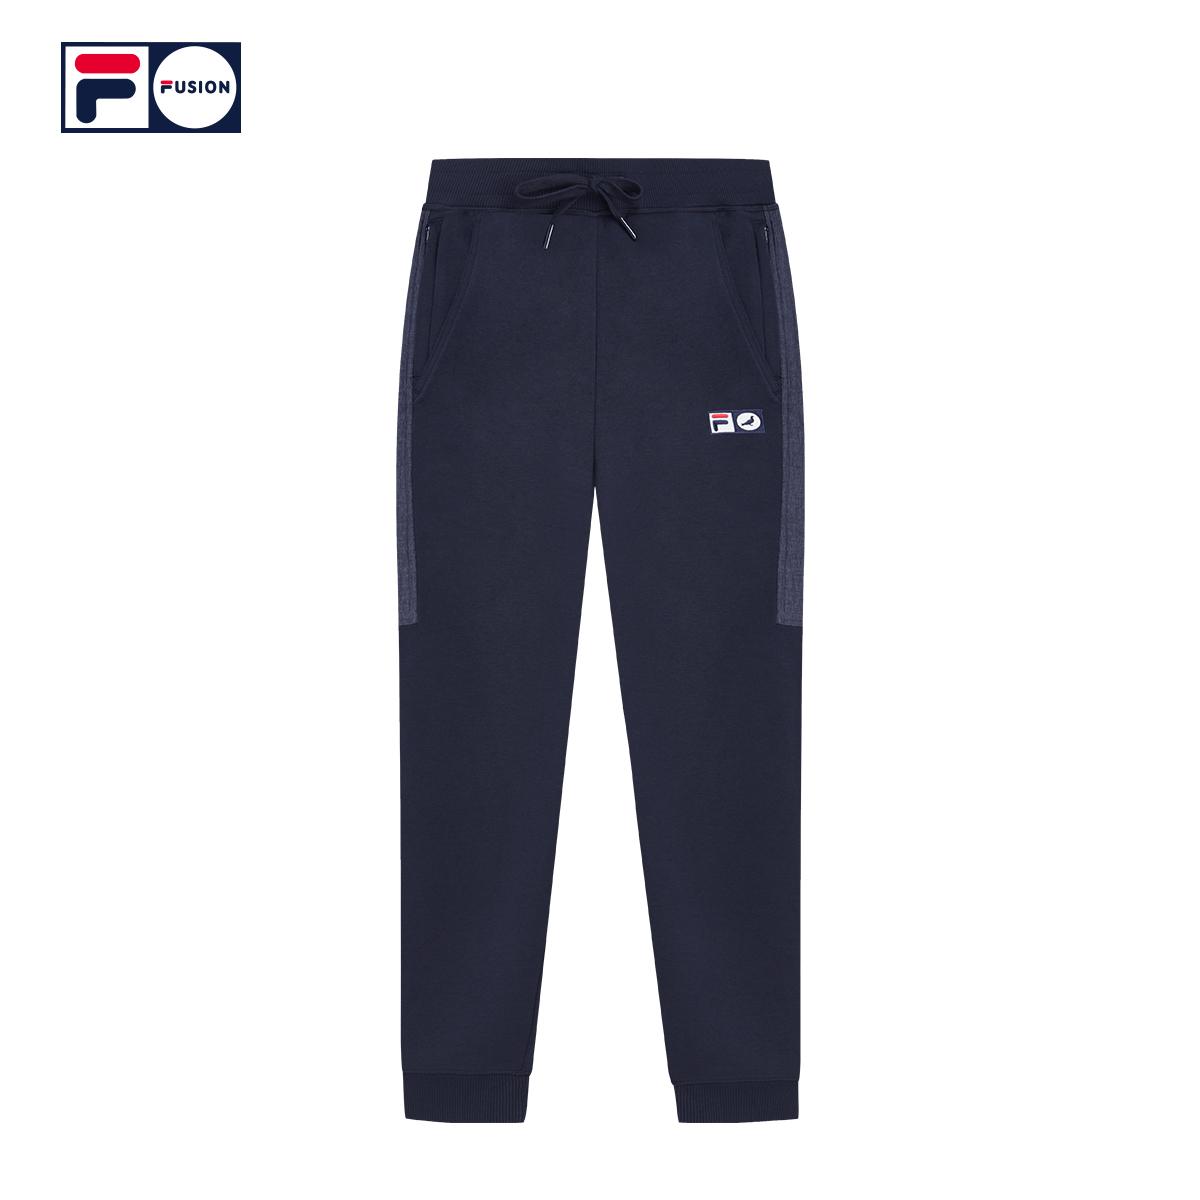 FILA FUSION X Staple斐乐长裤男2018秋季新品宽松透气运动裤男